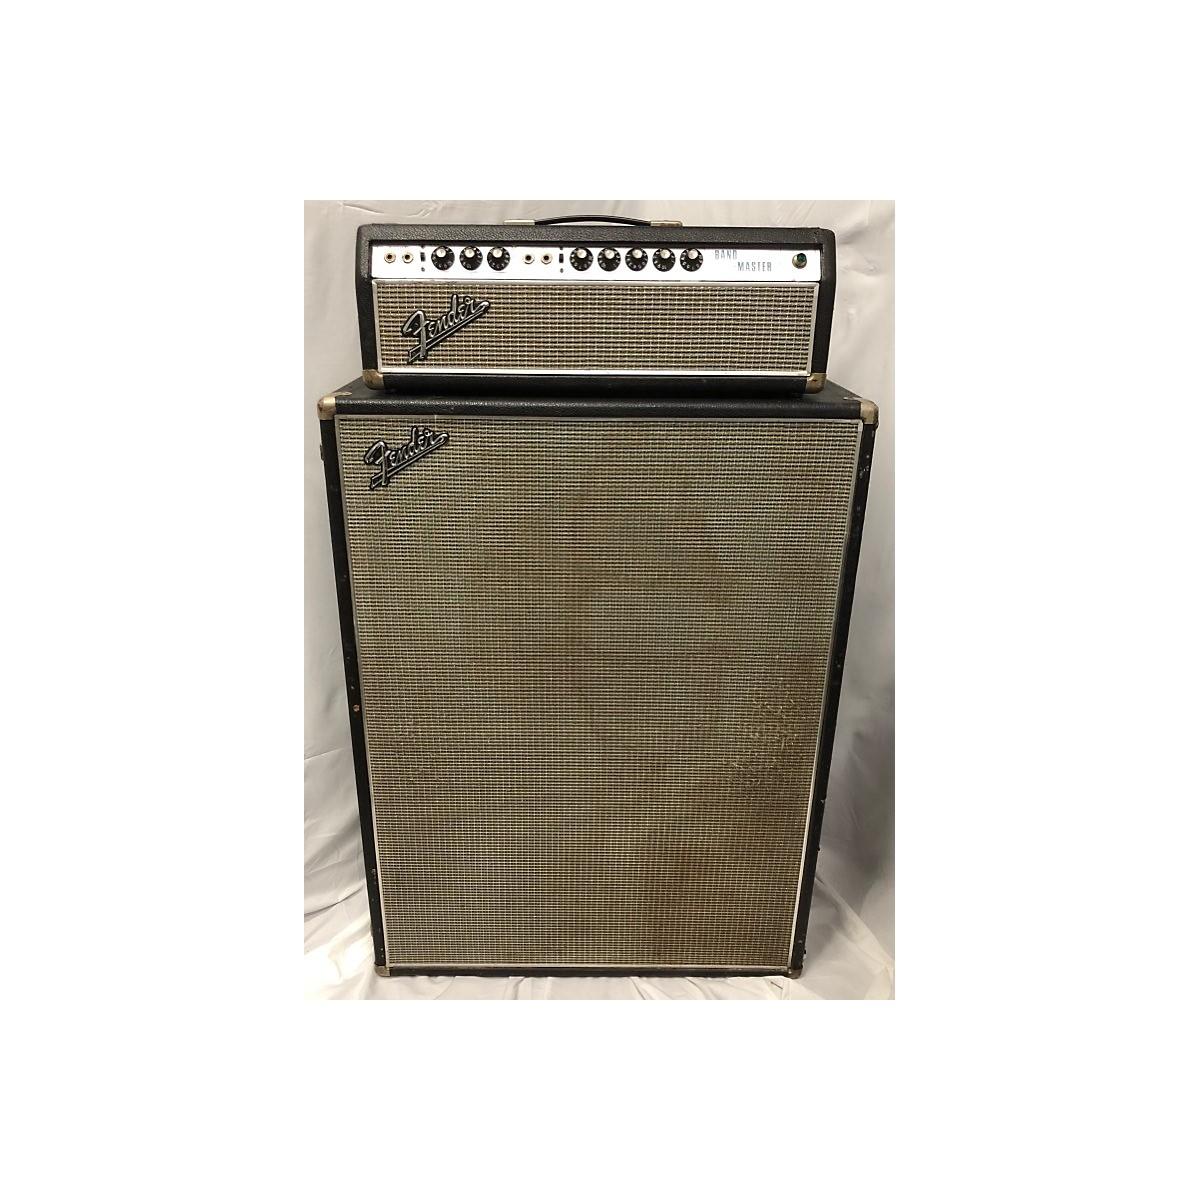 Fender 1968 Bandmaster Head & Cab Tube Guitar Amp Head